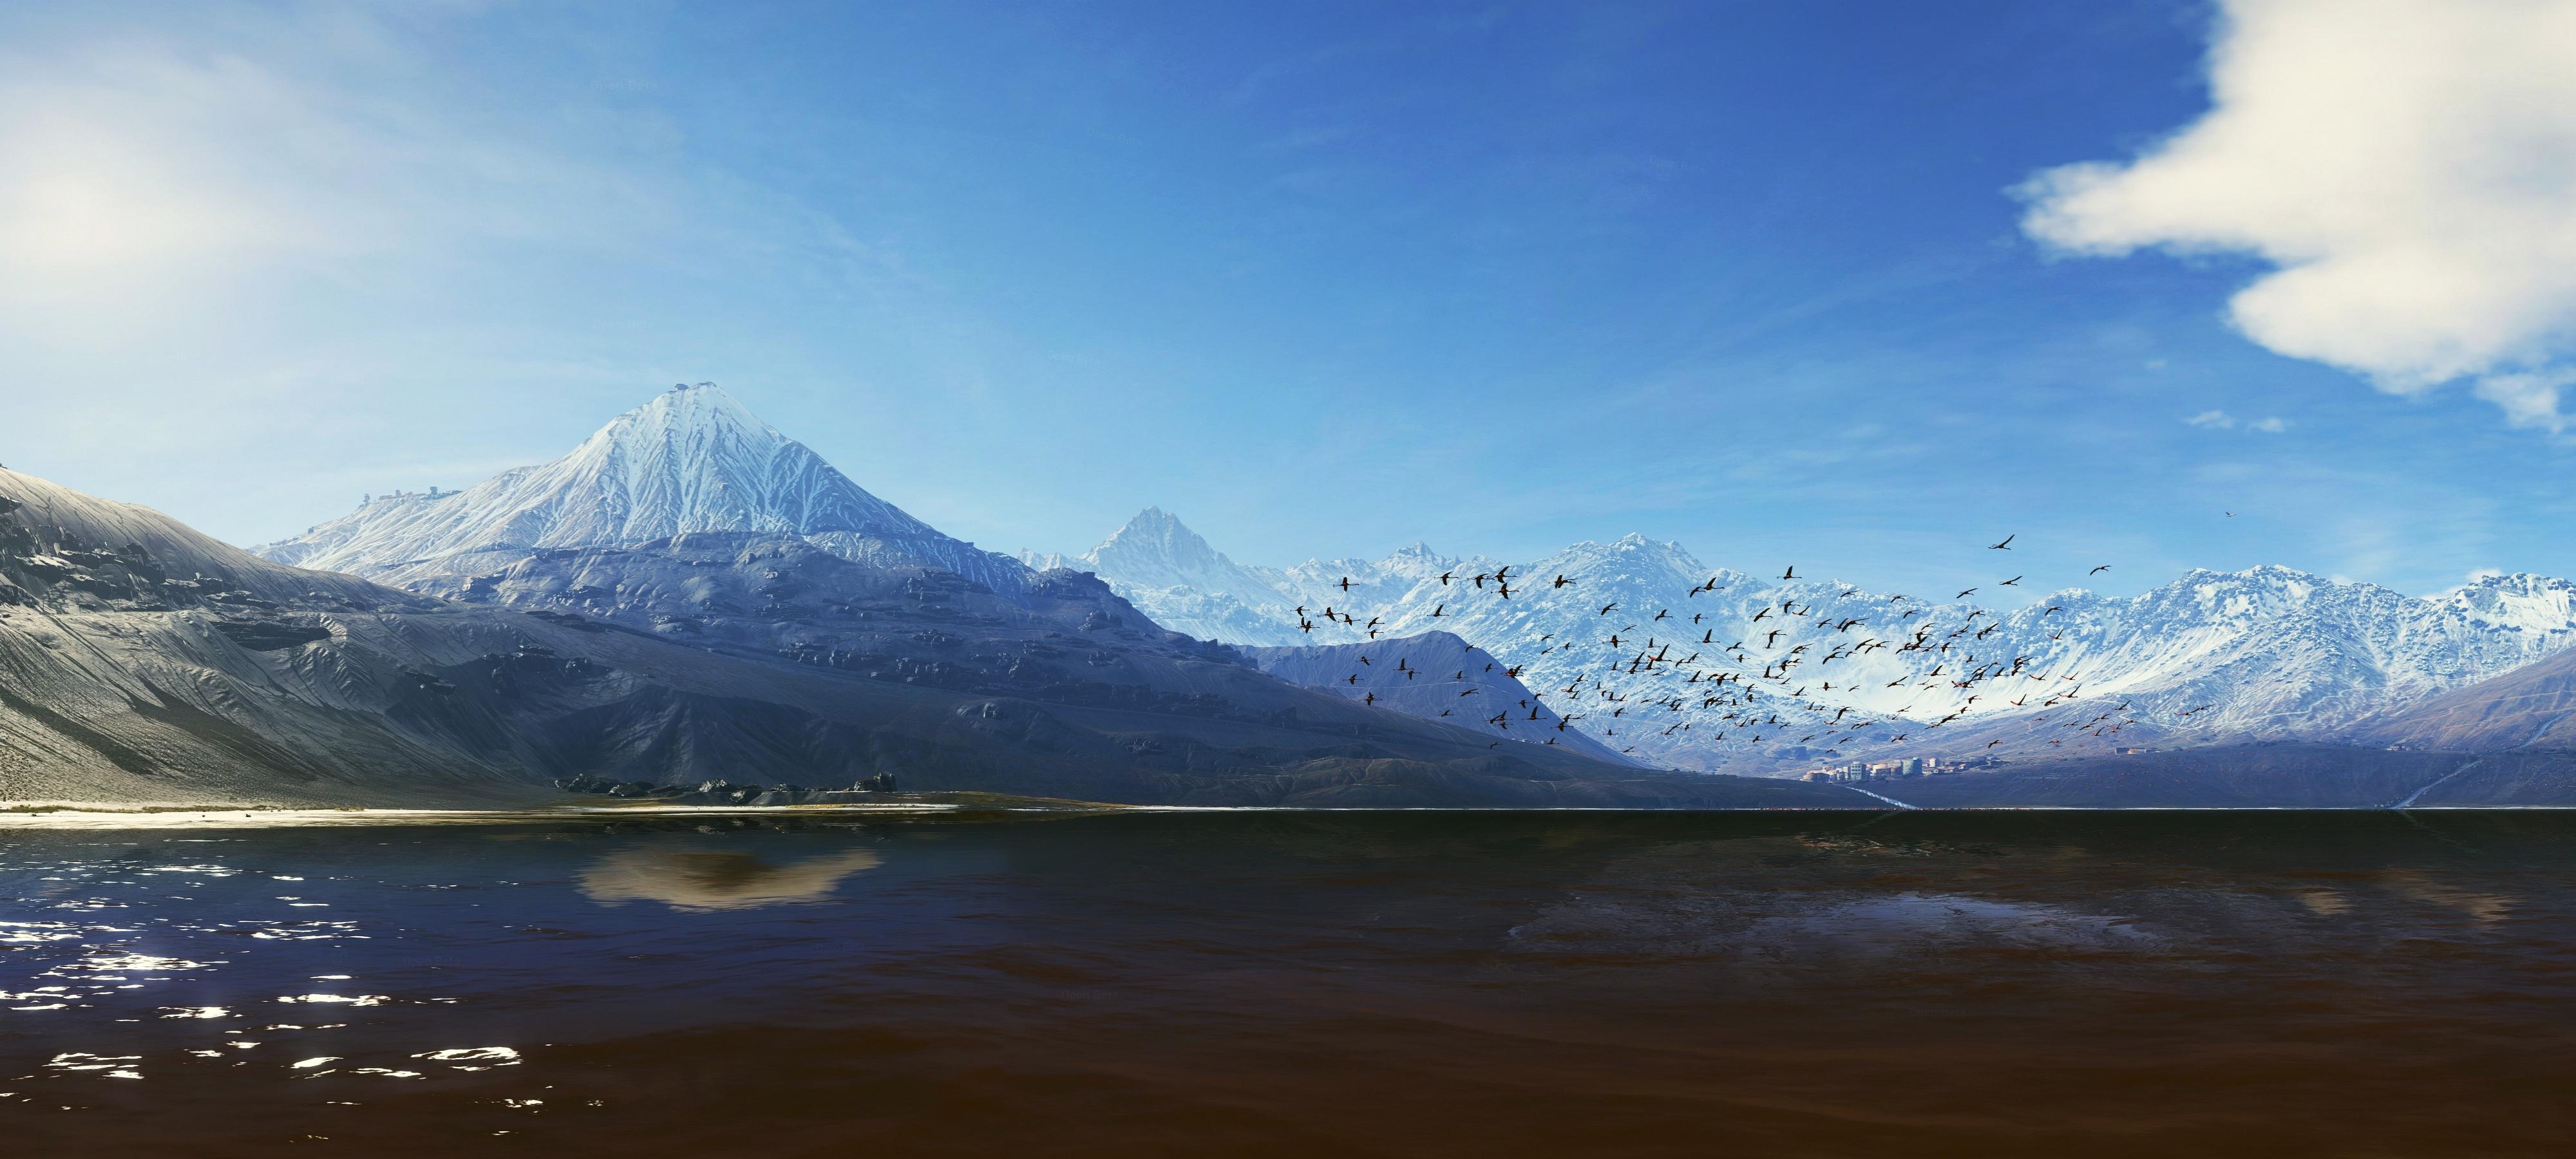 Tom Clancy S Ghost Recon Wildlands Wallpapers Pictures Images